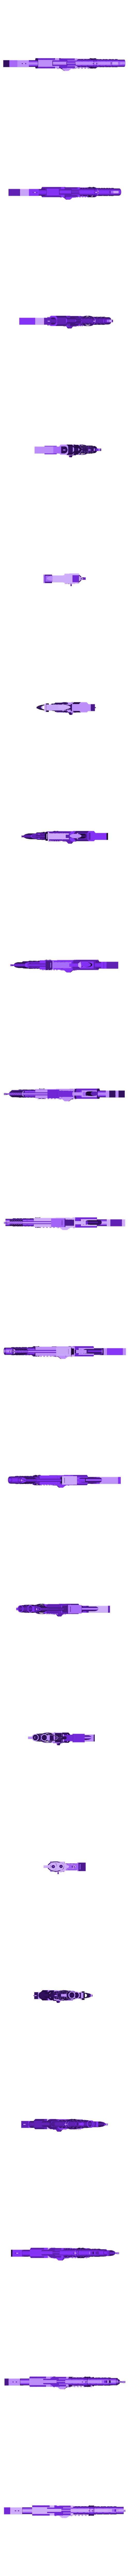 Mighty_Kustom_Scorcha.stl Télécharger fichier STL gratuit Ultra Hulky Mega Ork Nob • Plan imprimable en 3D, 40Emperor